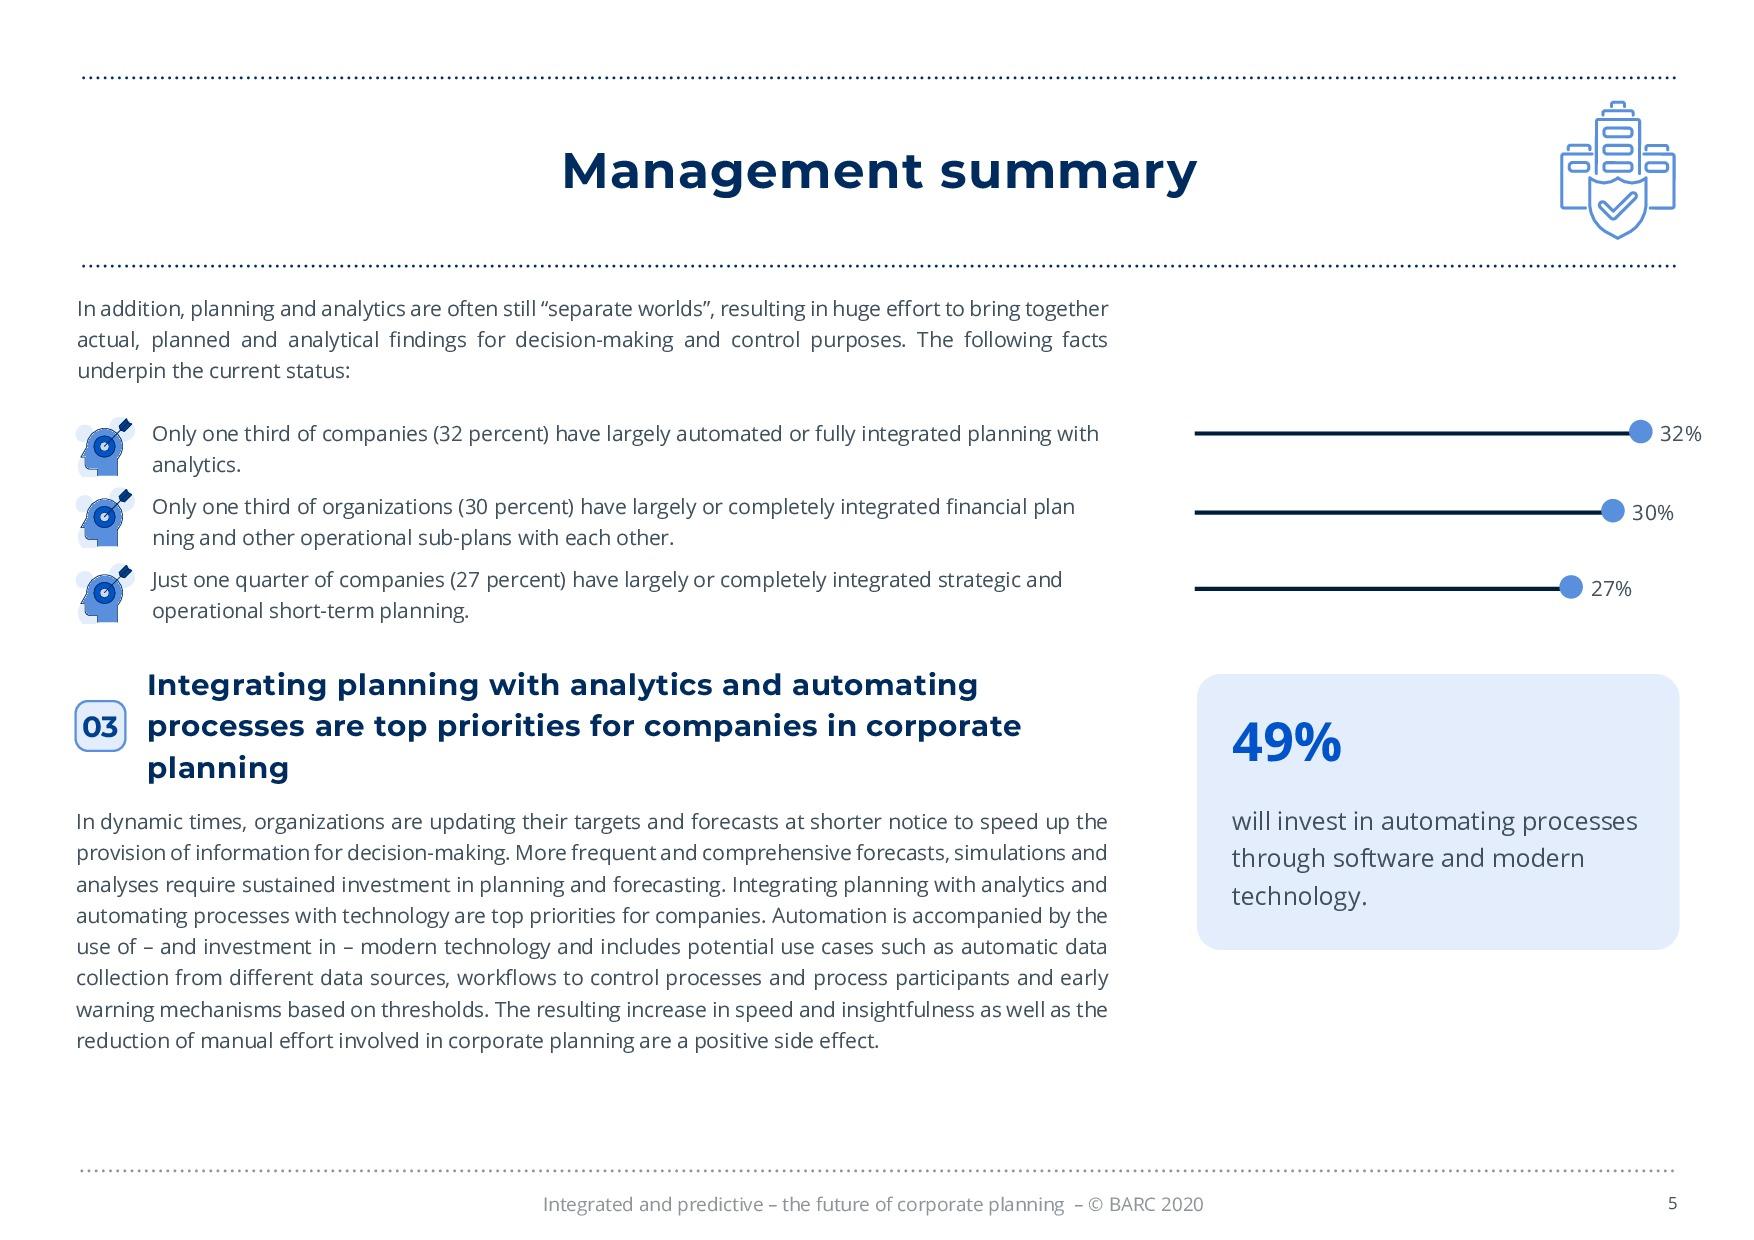 BARC – 統合と予測 – 経営計画の未来 | Page 5